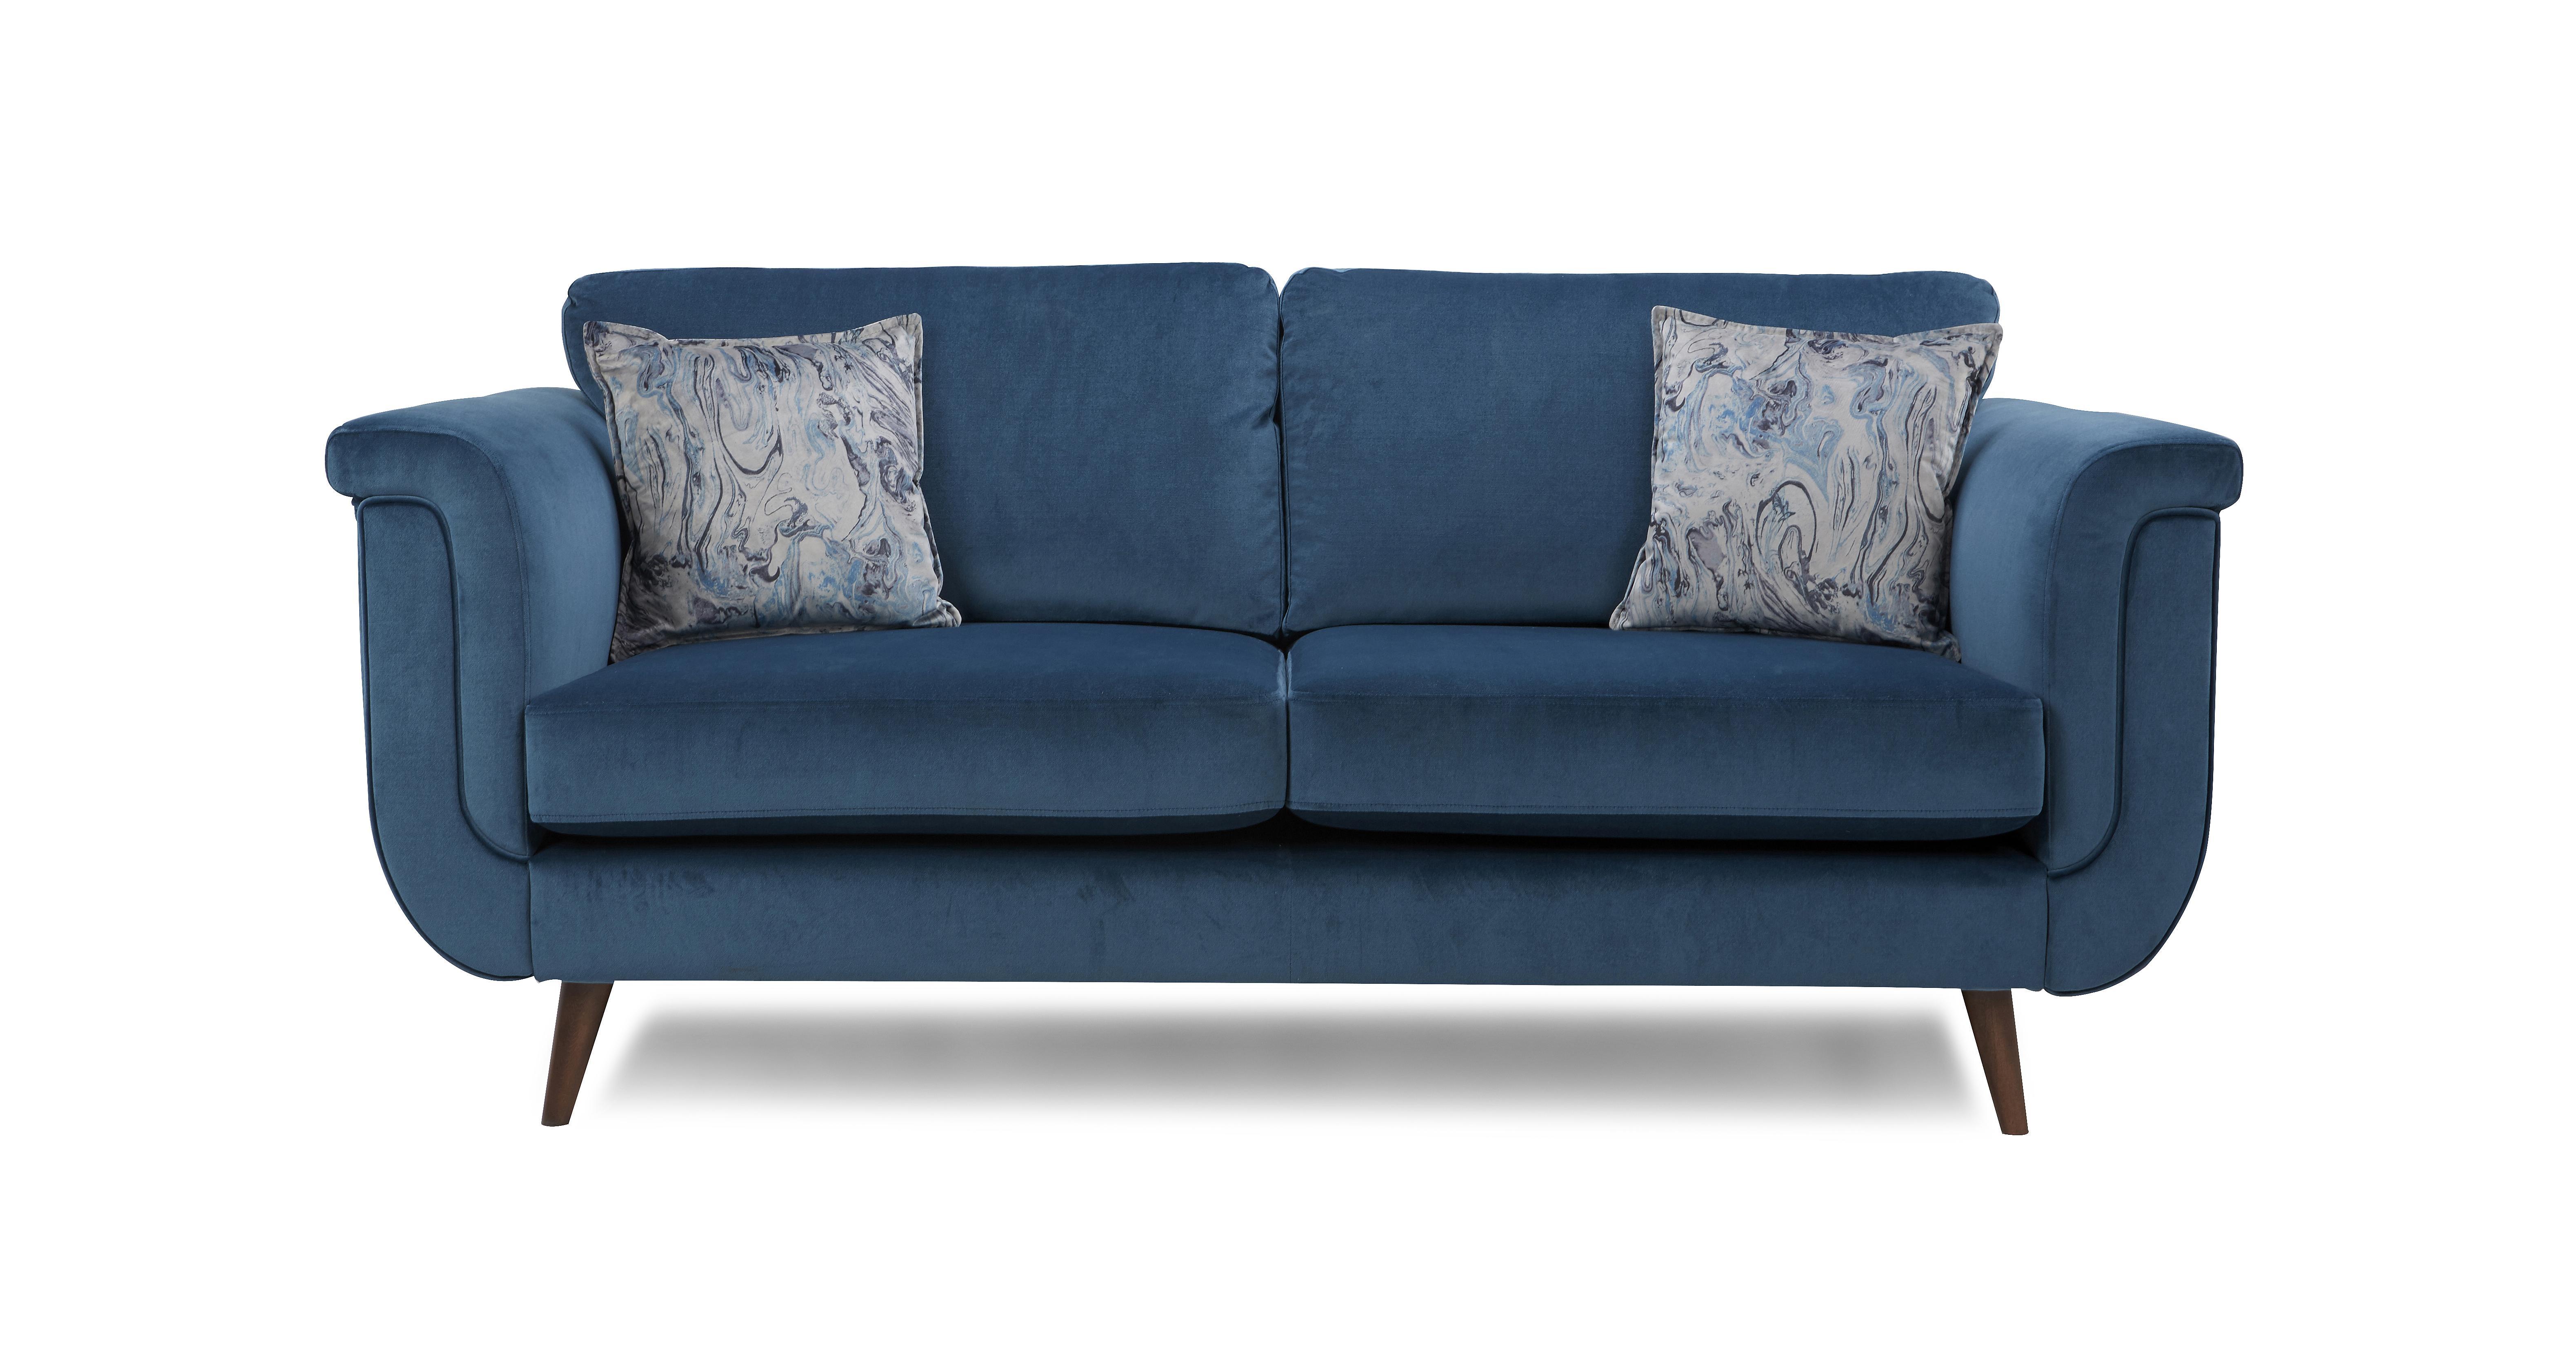 Dfs sofa clearance for Sofa clearance